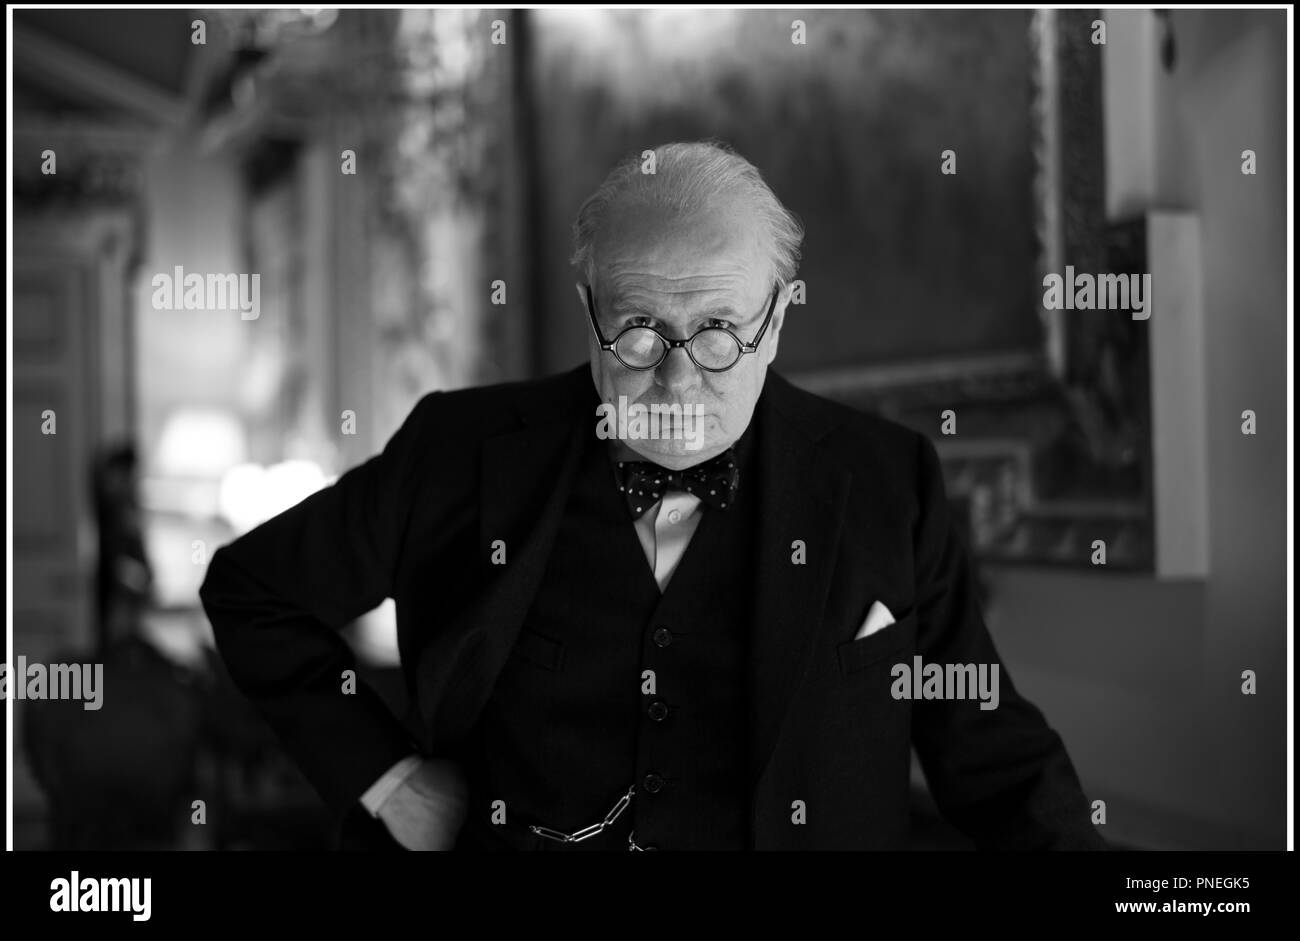 Gary oldman black and white stock photos images alamy